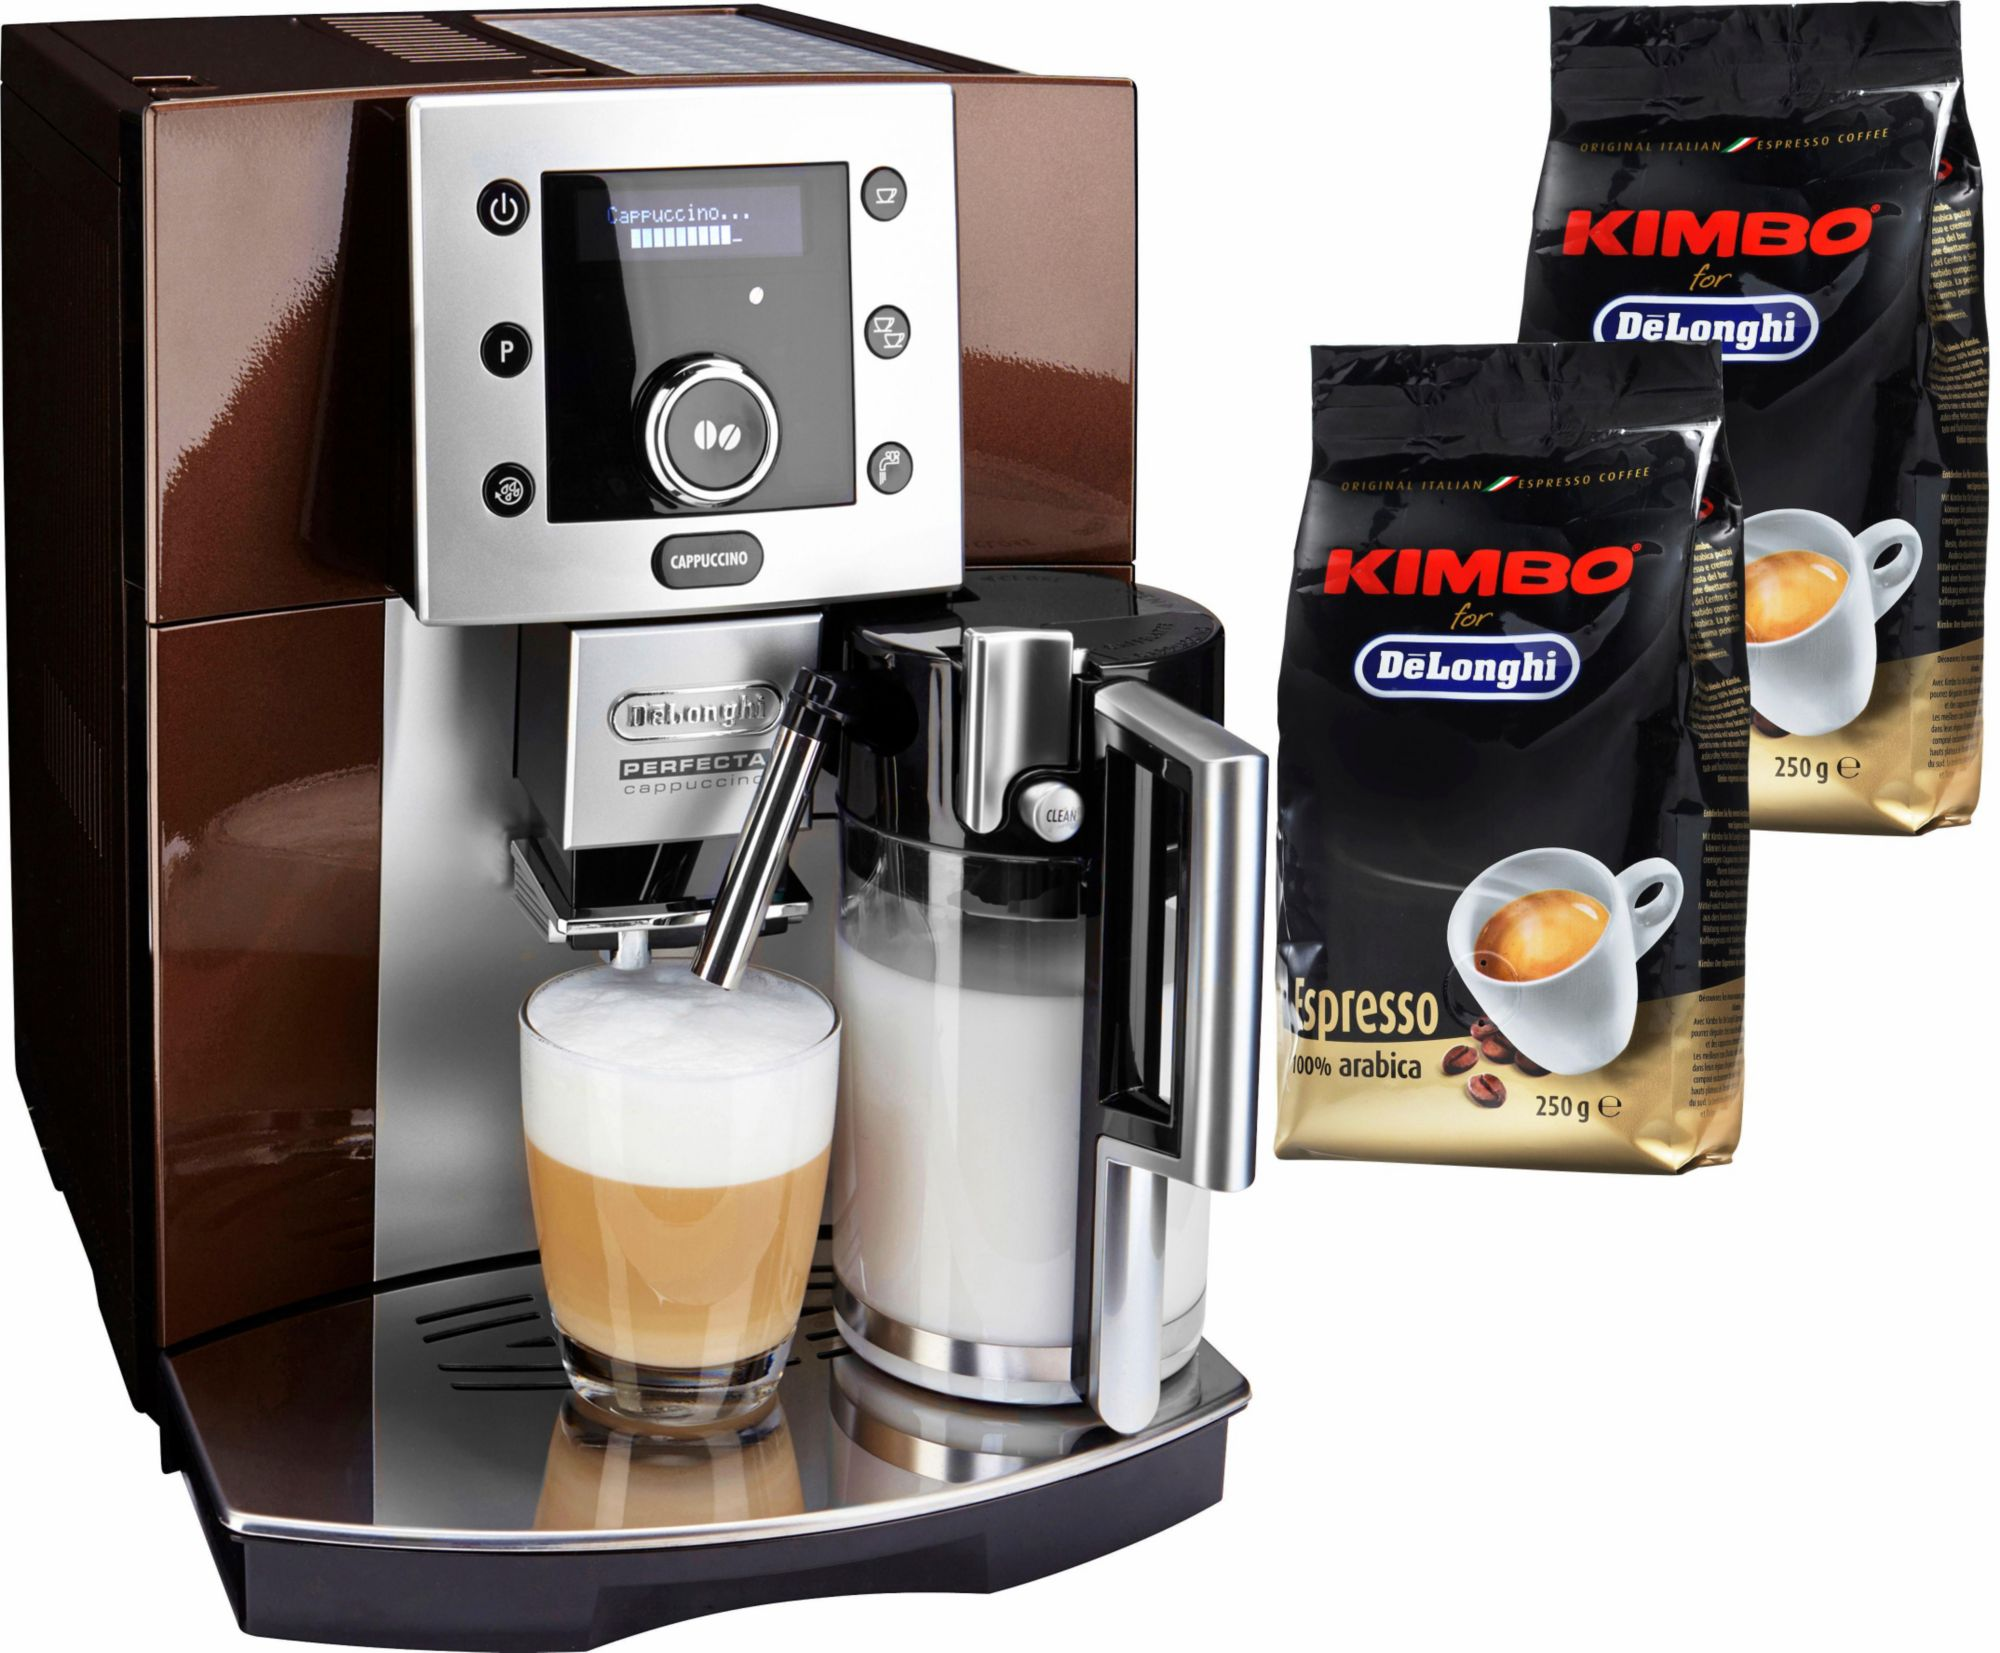 de 39 longhi kaffeevollautomat perfecta esam 5550 schwab versand bunter haushalt. Black Bedroom Furniture Sets. Home Design Ideas